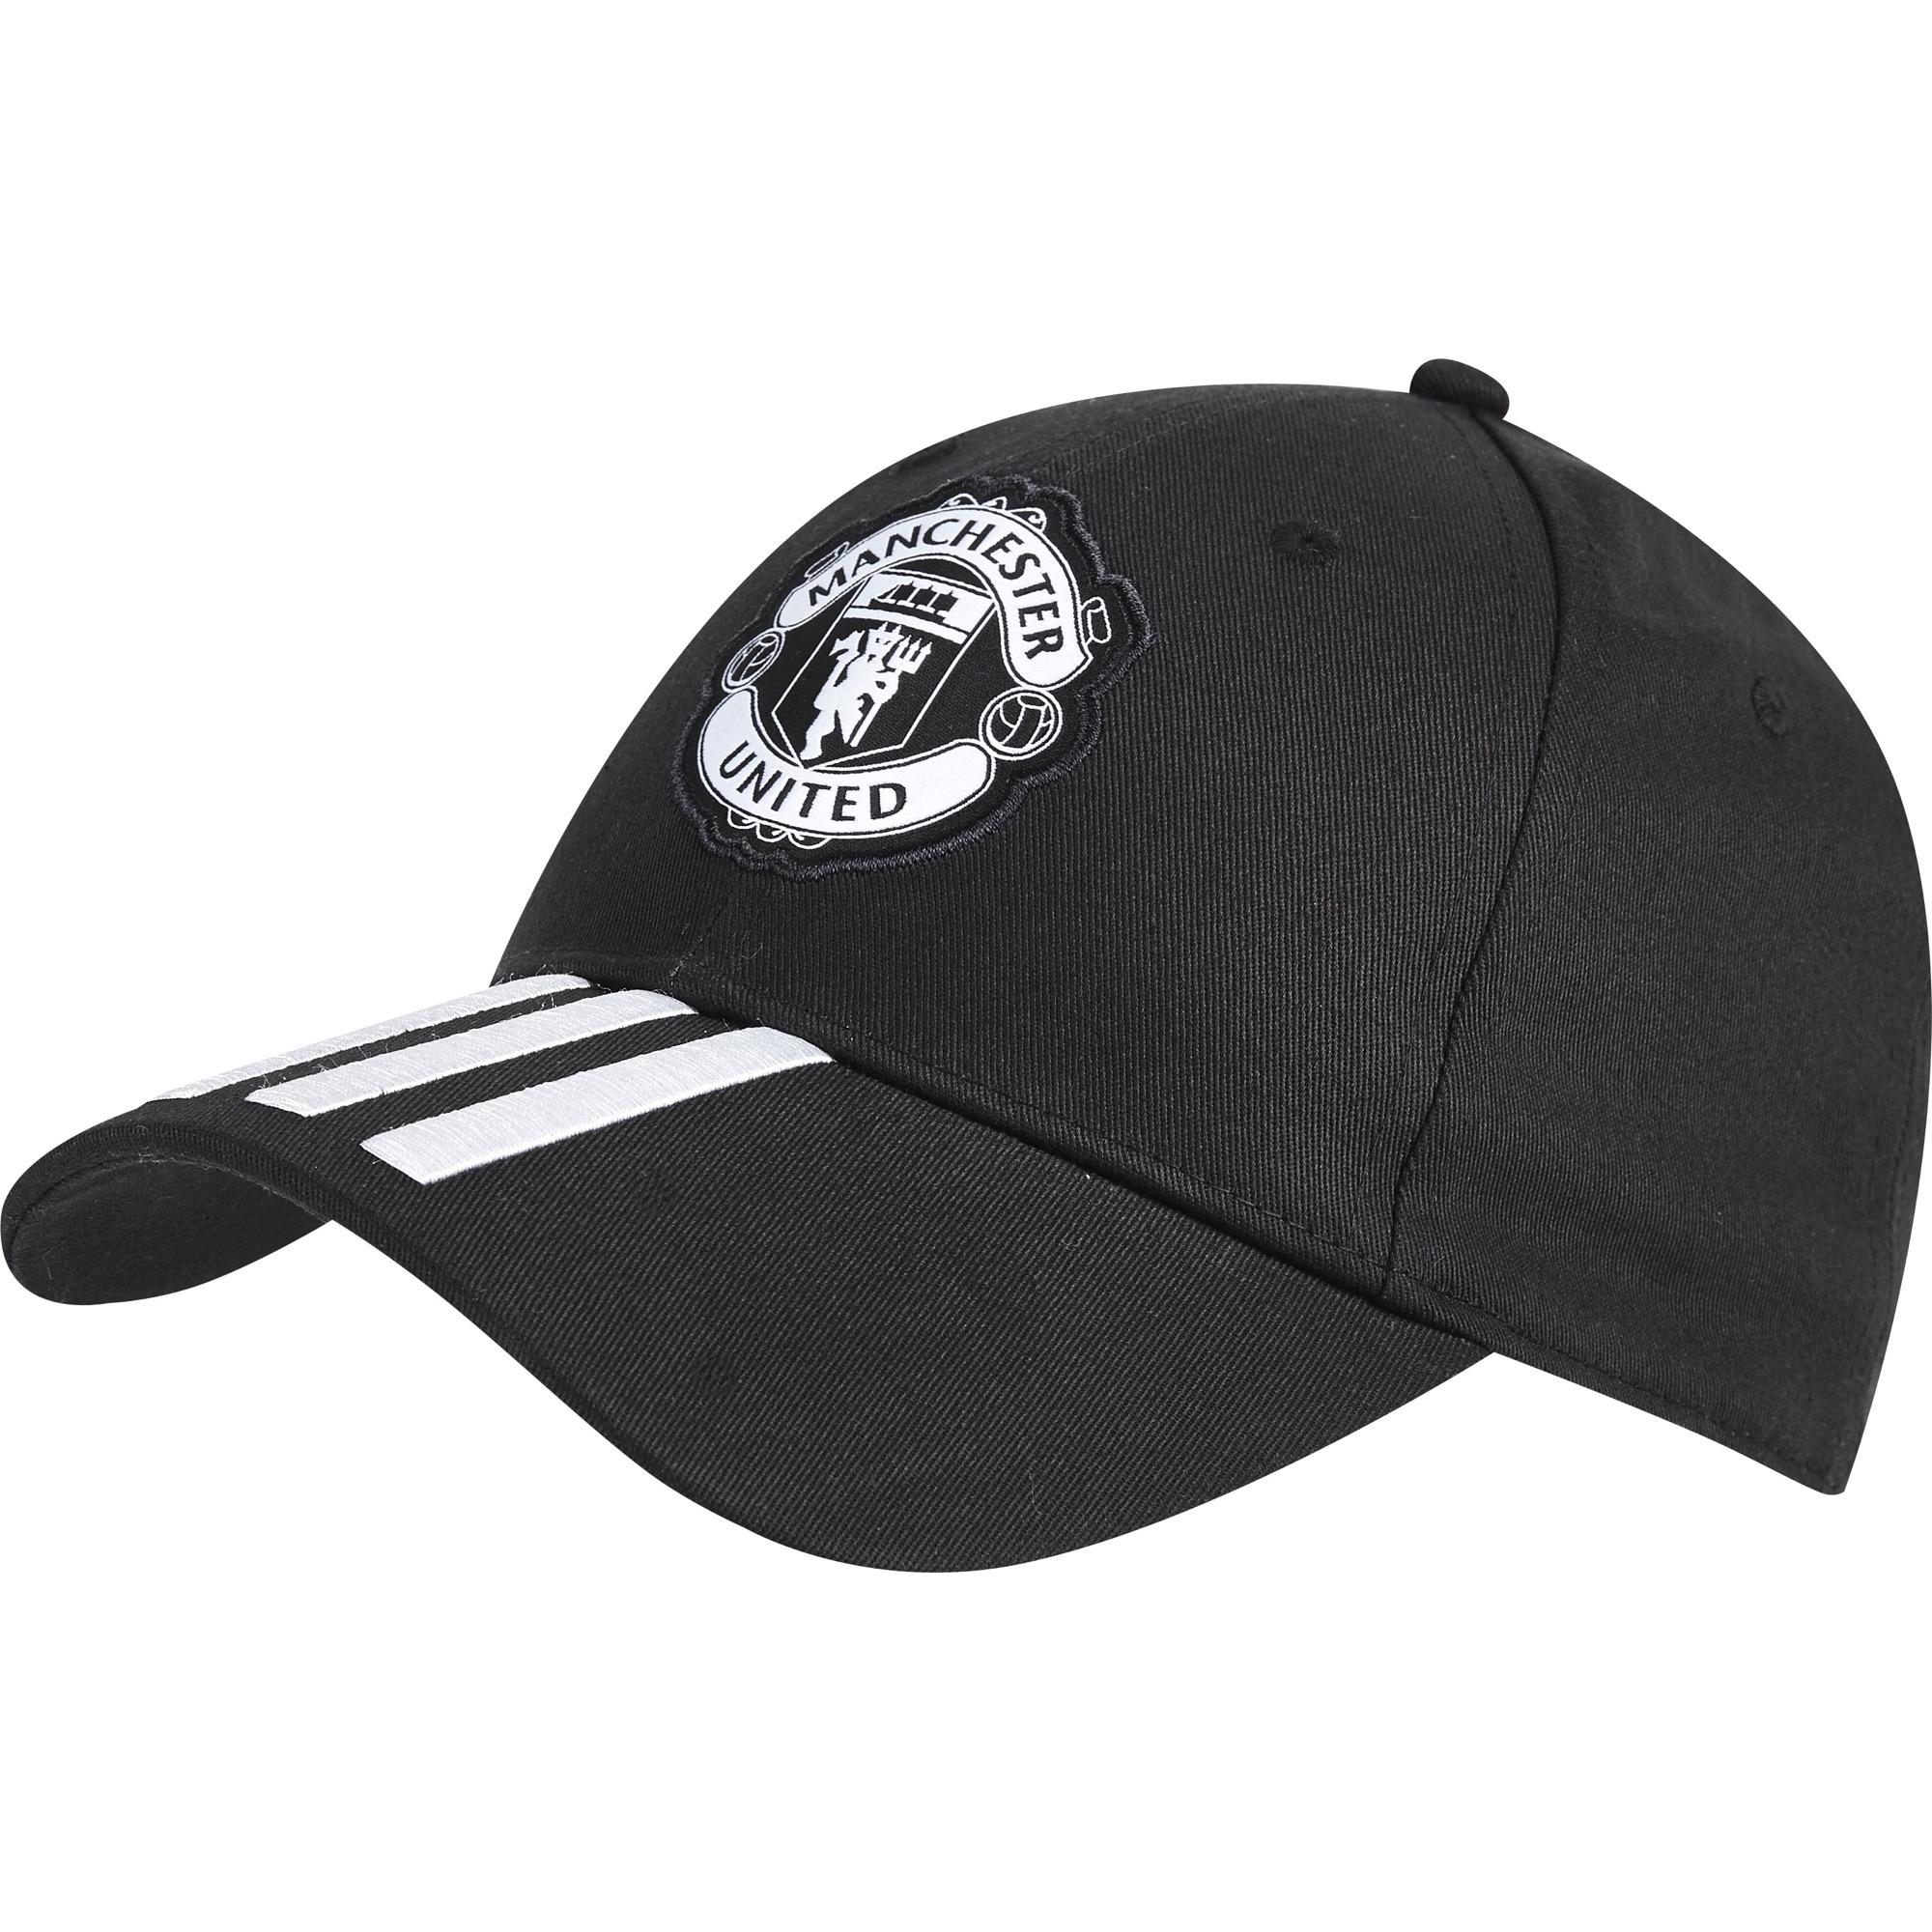 Manchester United 3 Stripe Cap - Black